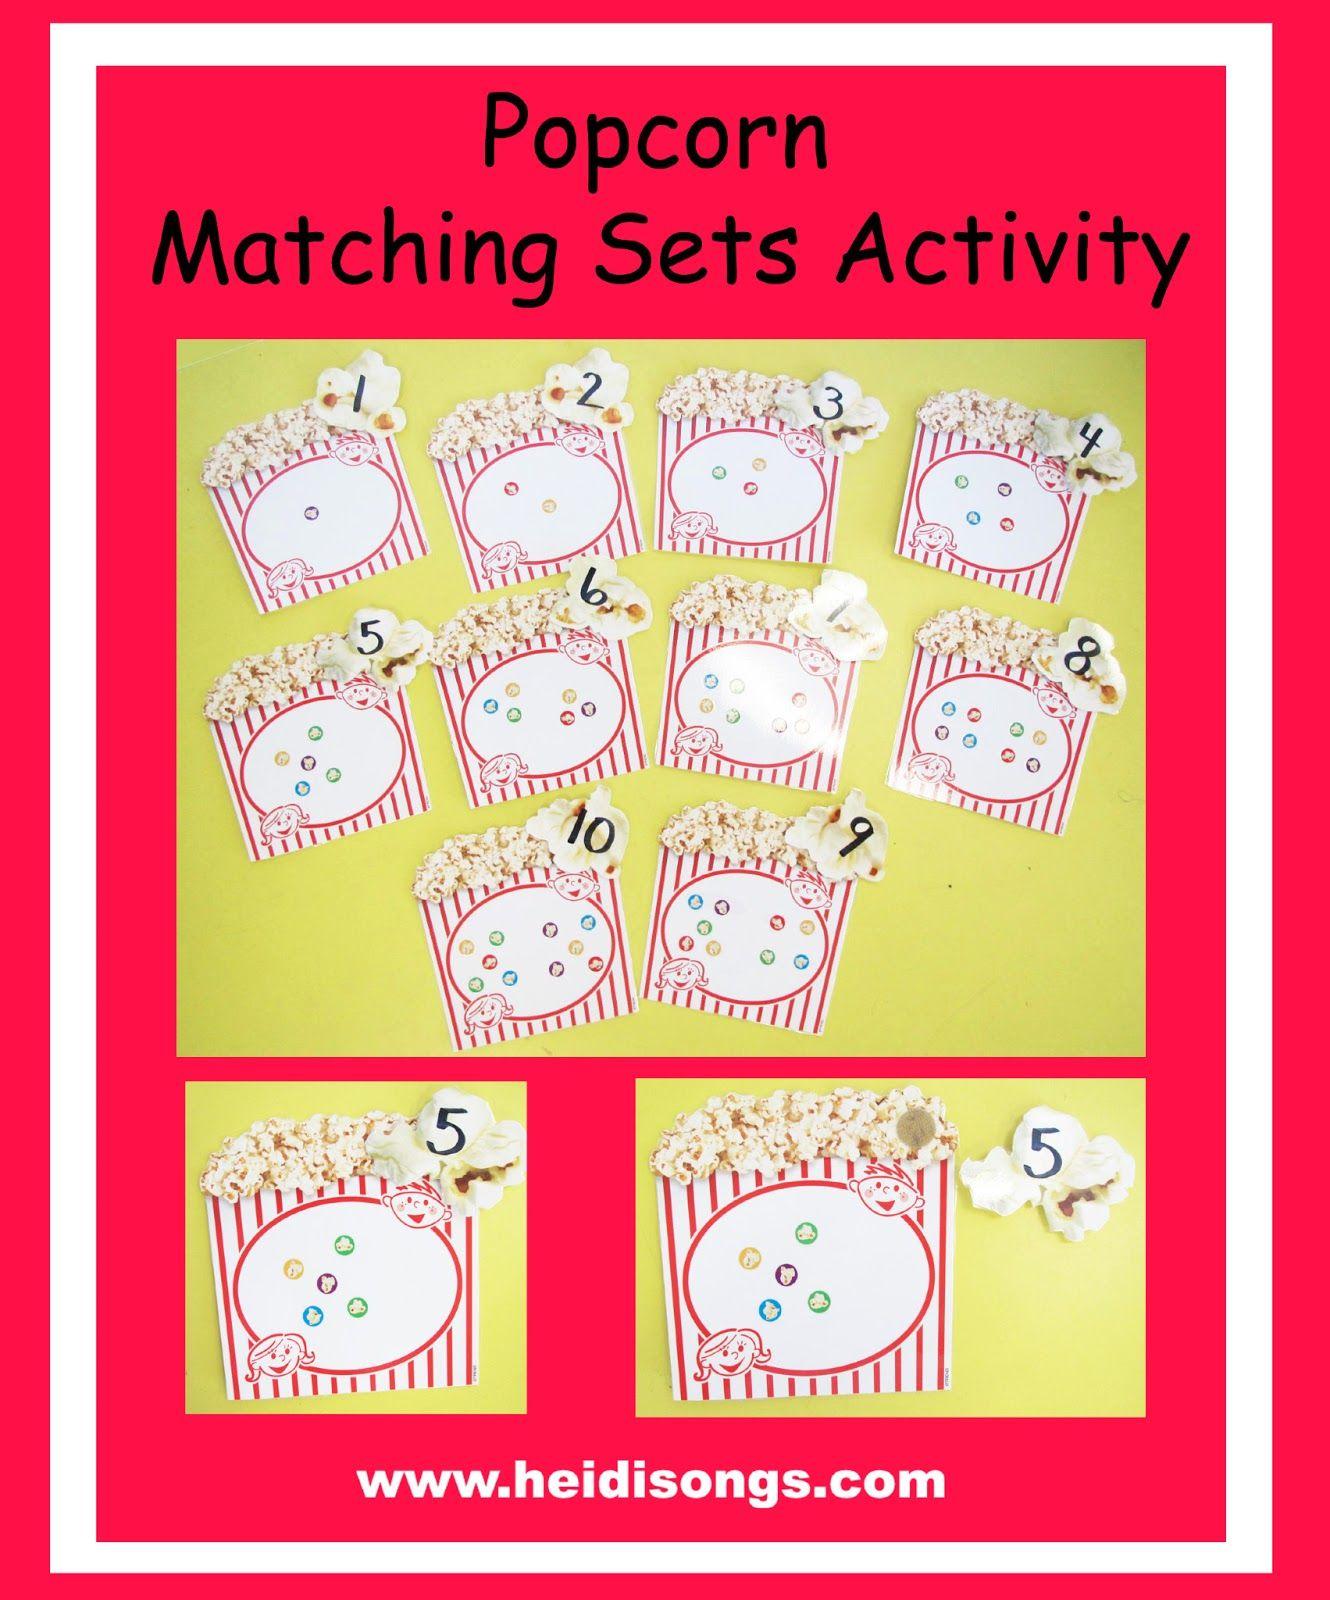 Popcorn Matching Sets Activity